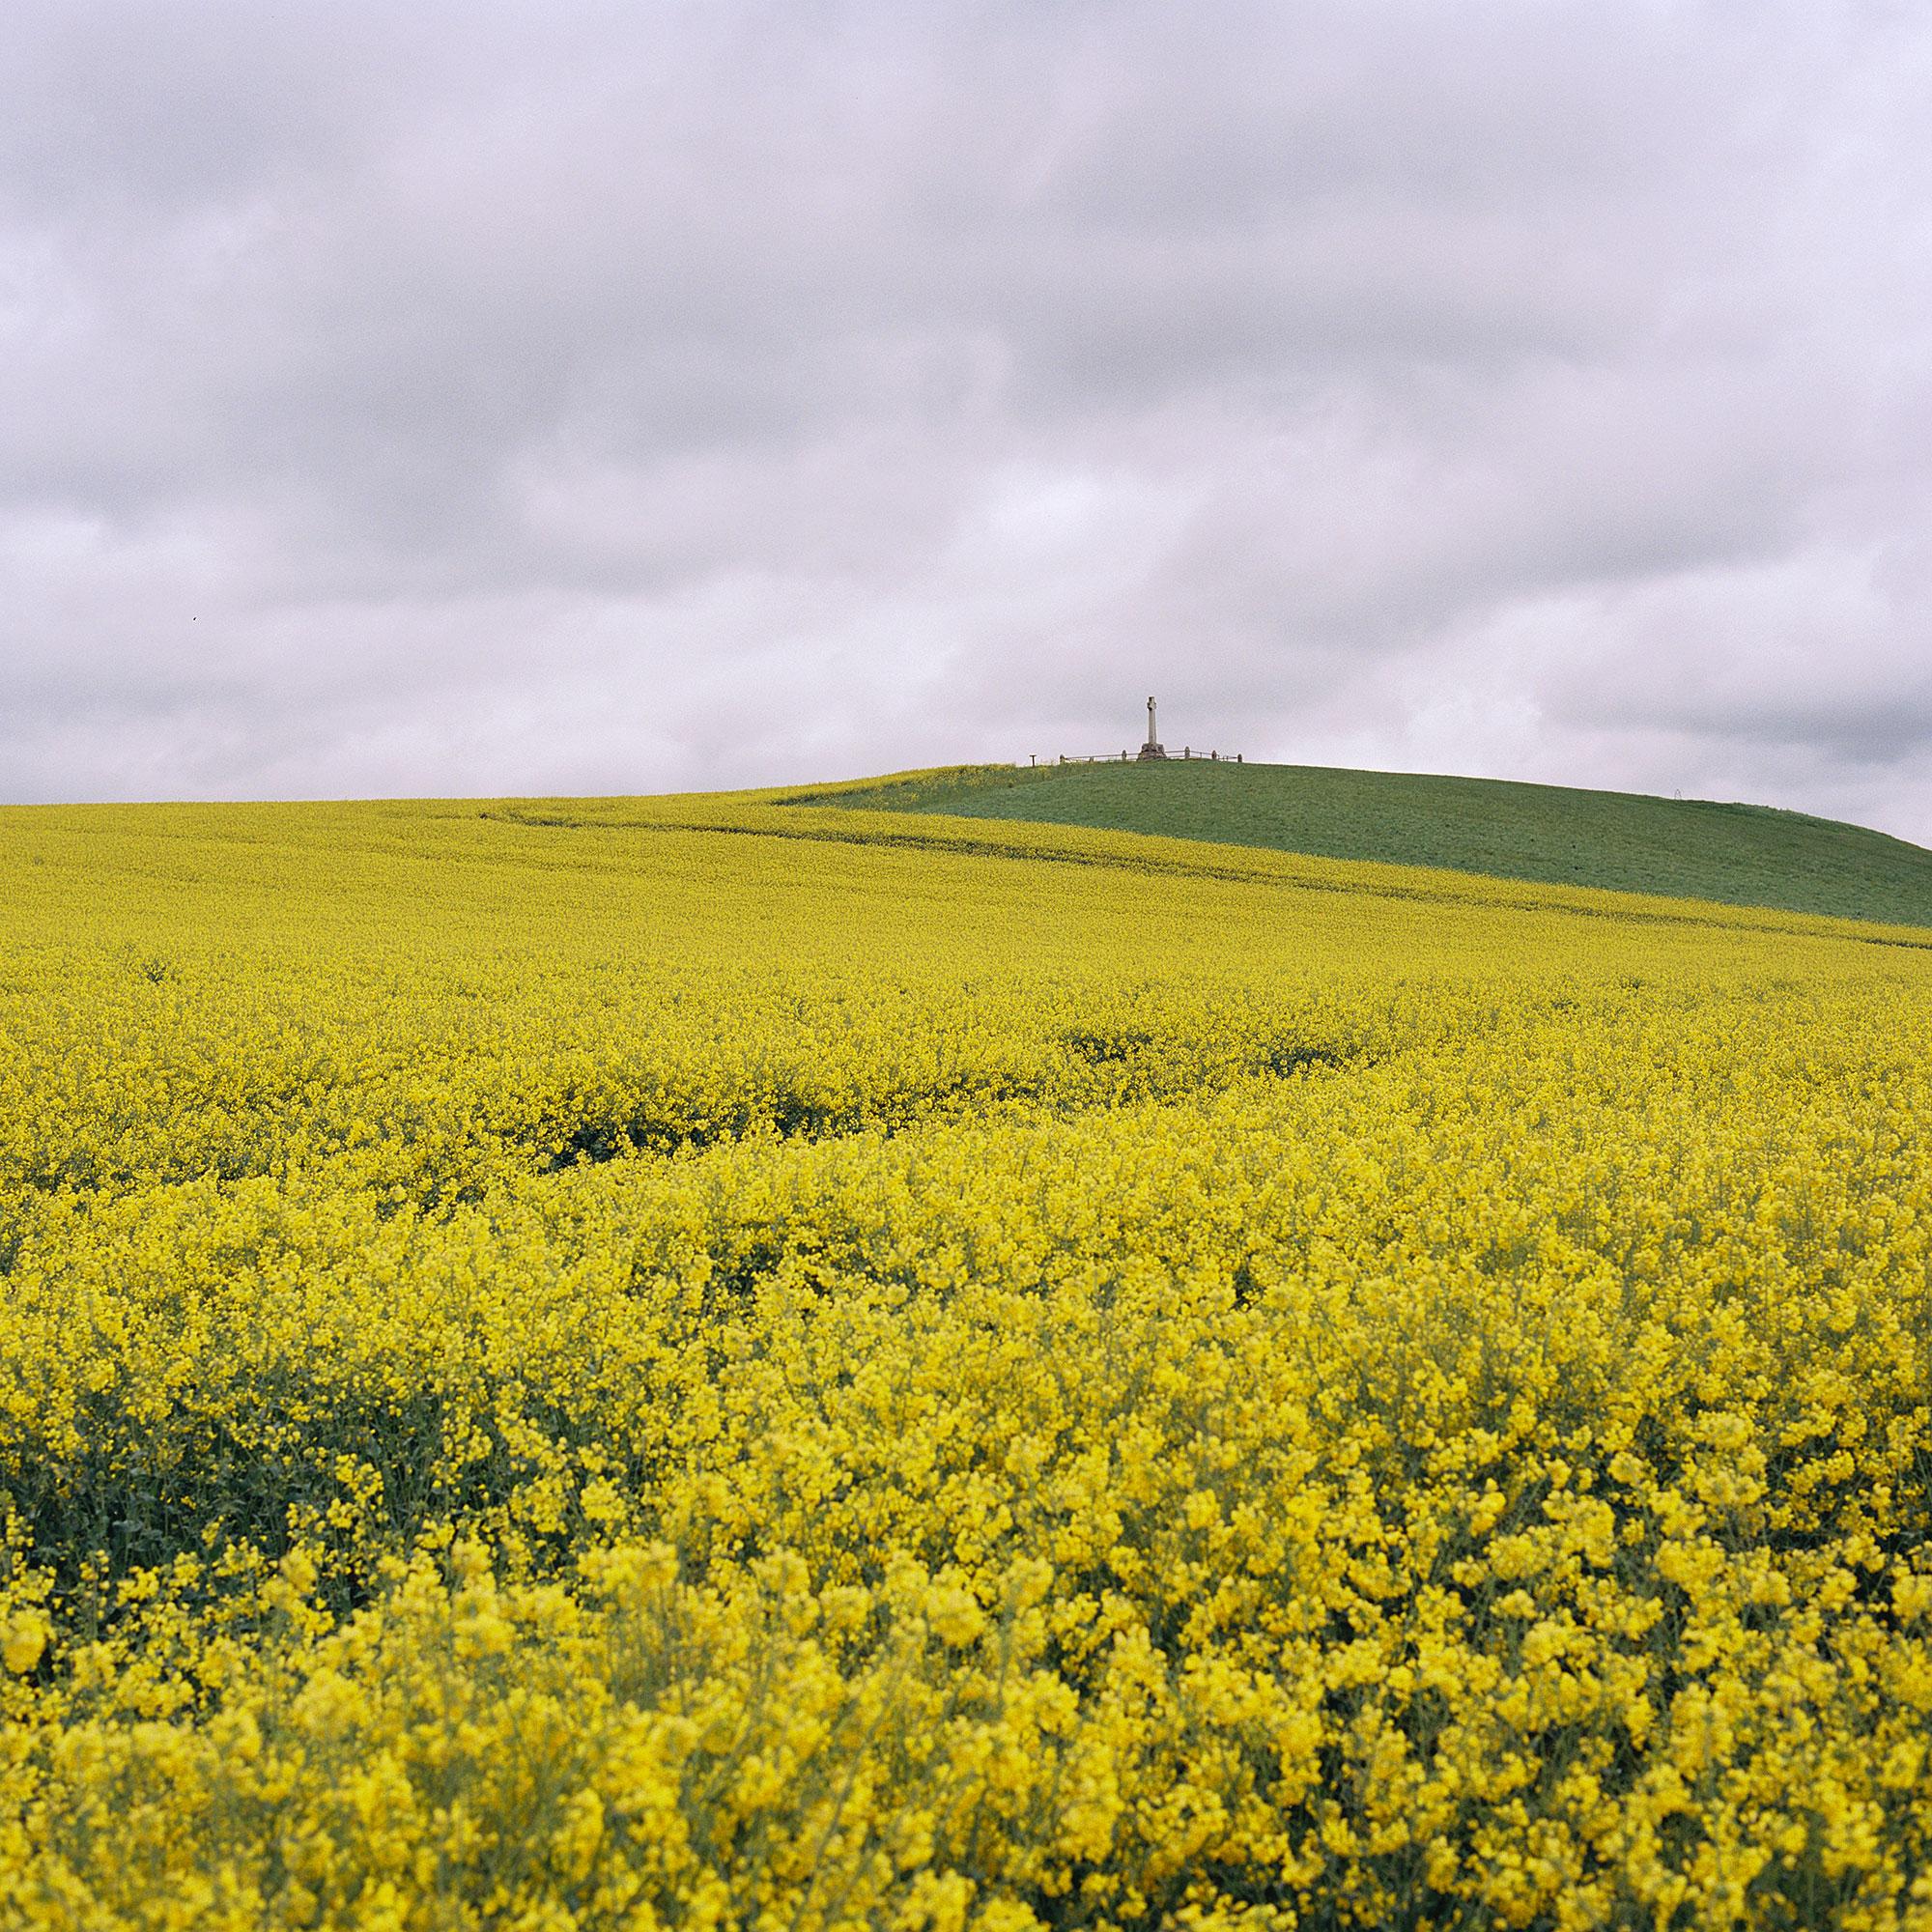 A  eld of oilseed rape beneath The Battle of Flodden memorial in Branxton, Northumberland, England